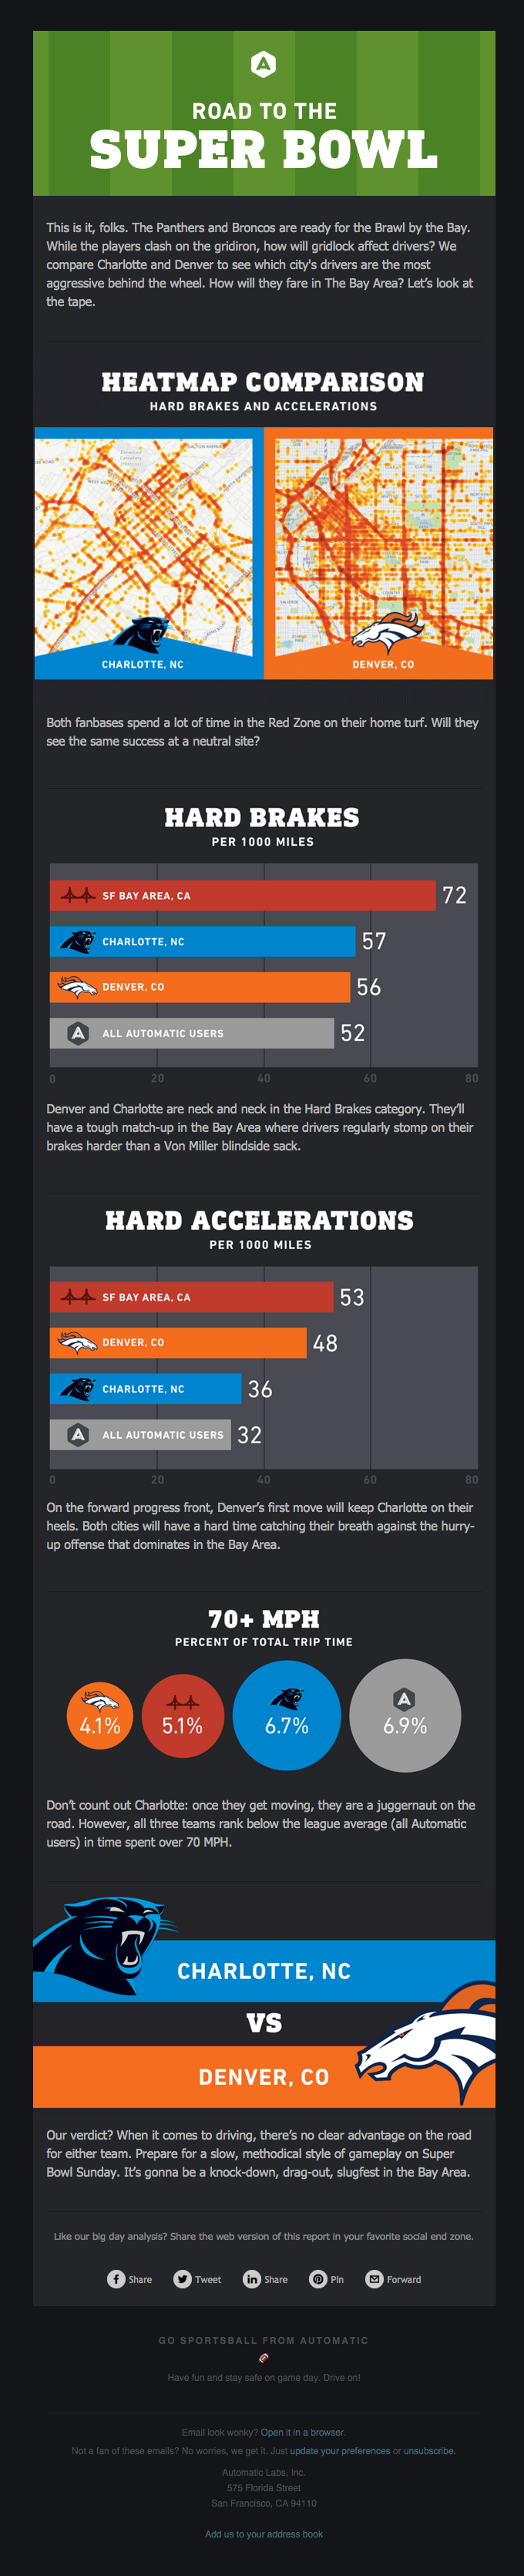 Big Data vs The Big Game: How do Super Bowl fans drive?